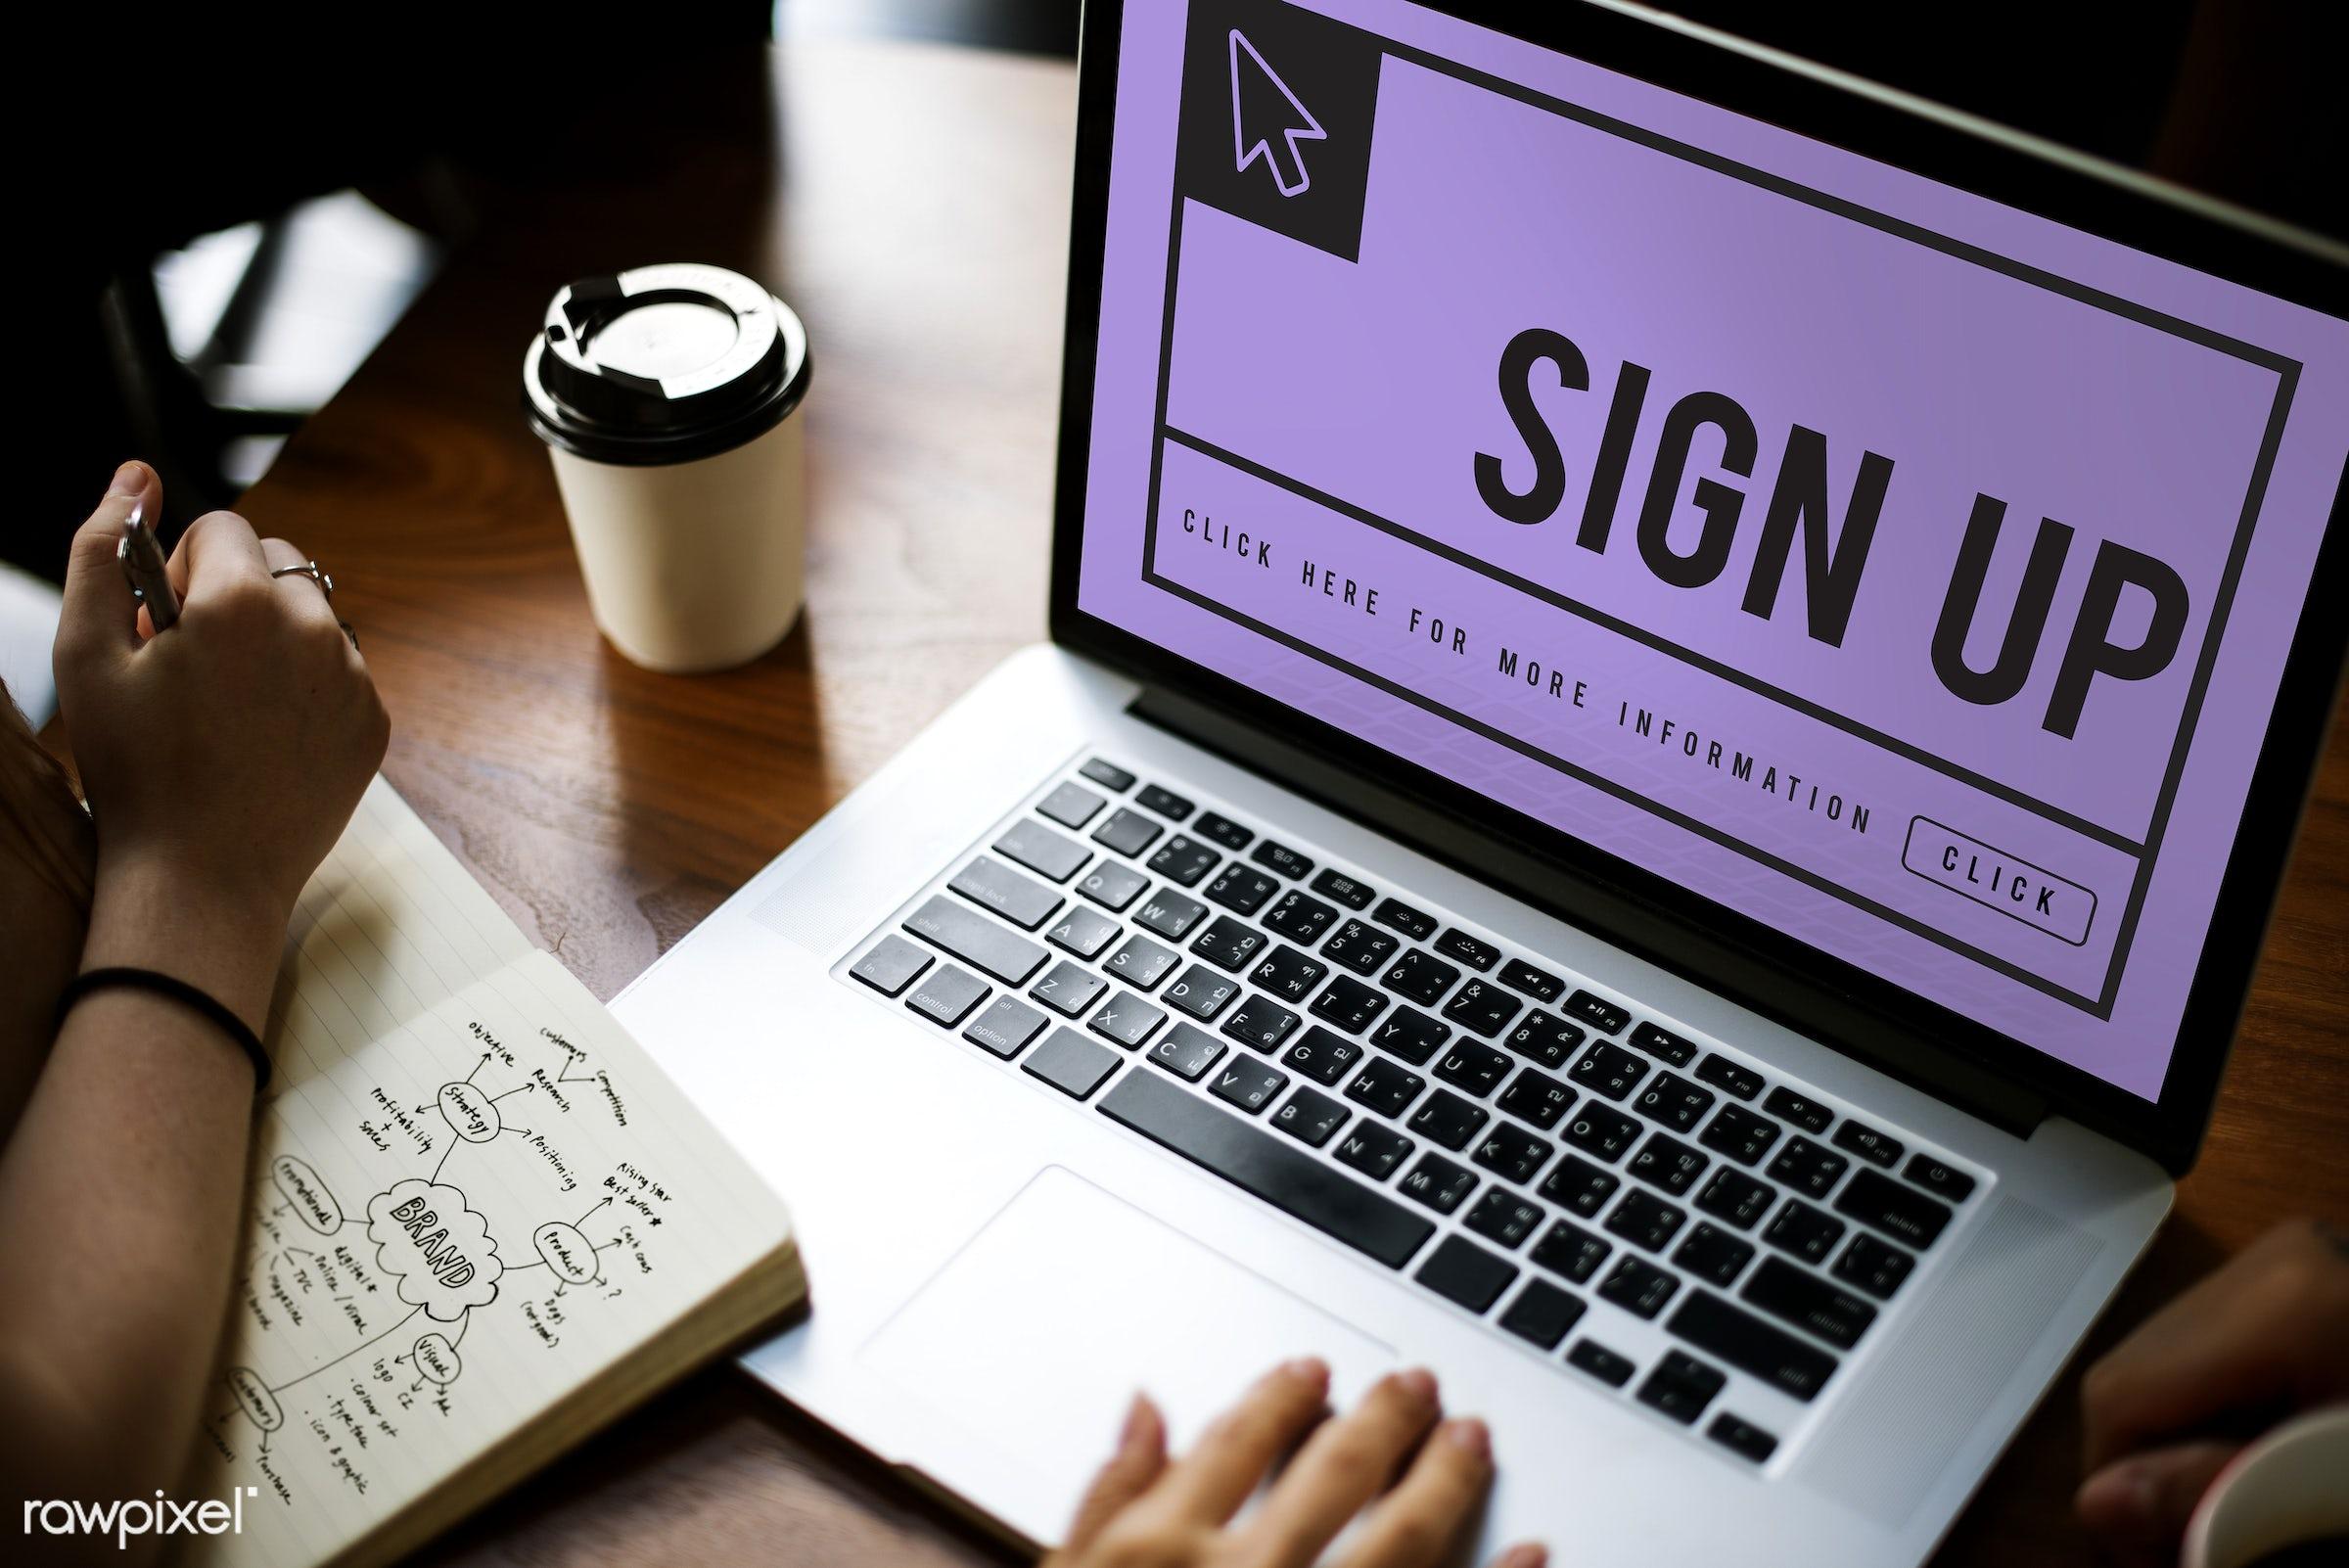 register, account, arrow, browsing, click, coffee cup, cursor, device, digital, digital device, enter, hands, icon,...